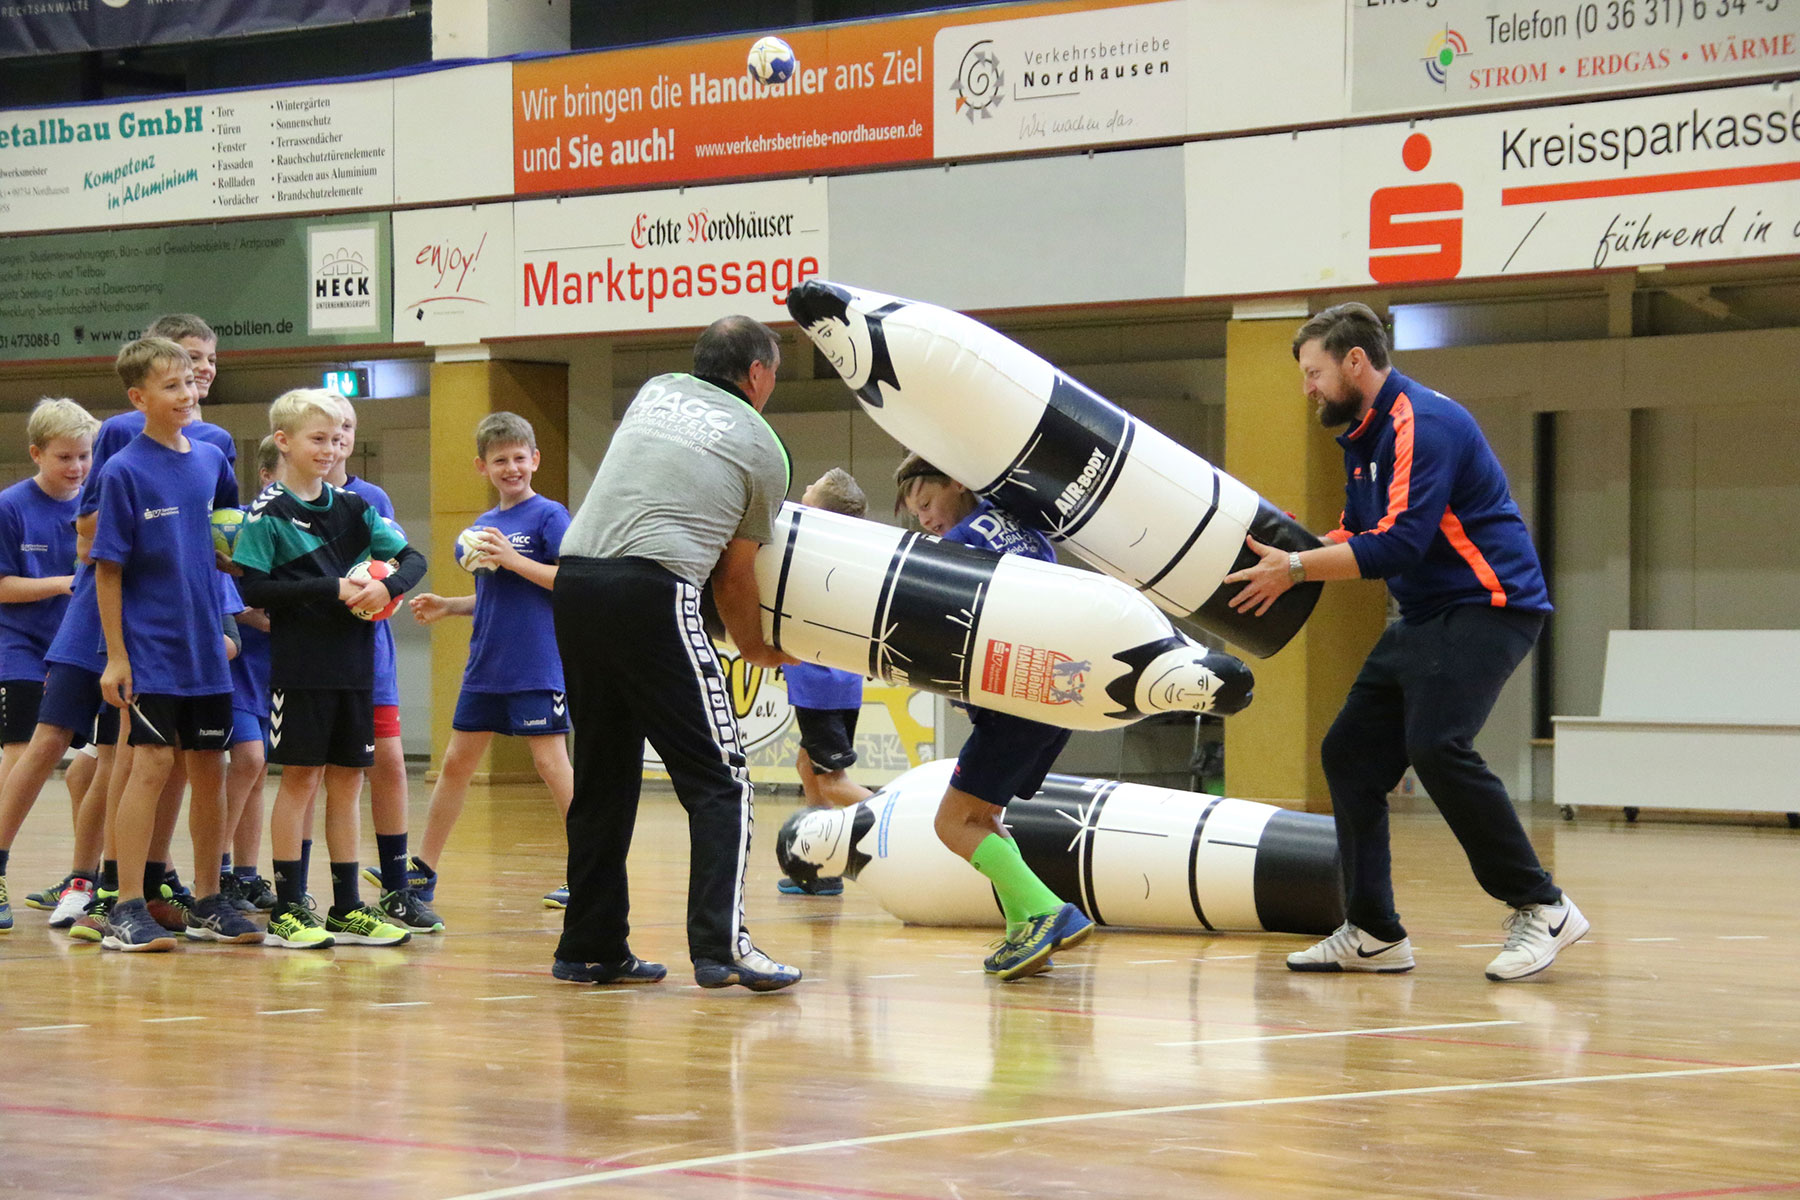 201809_Handballcamp_NDH (66)